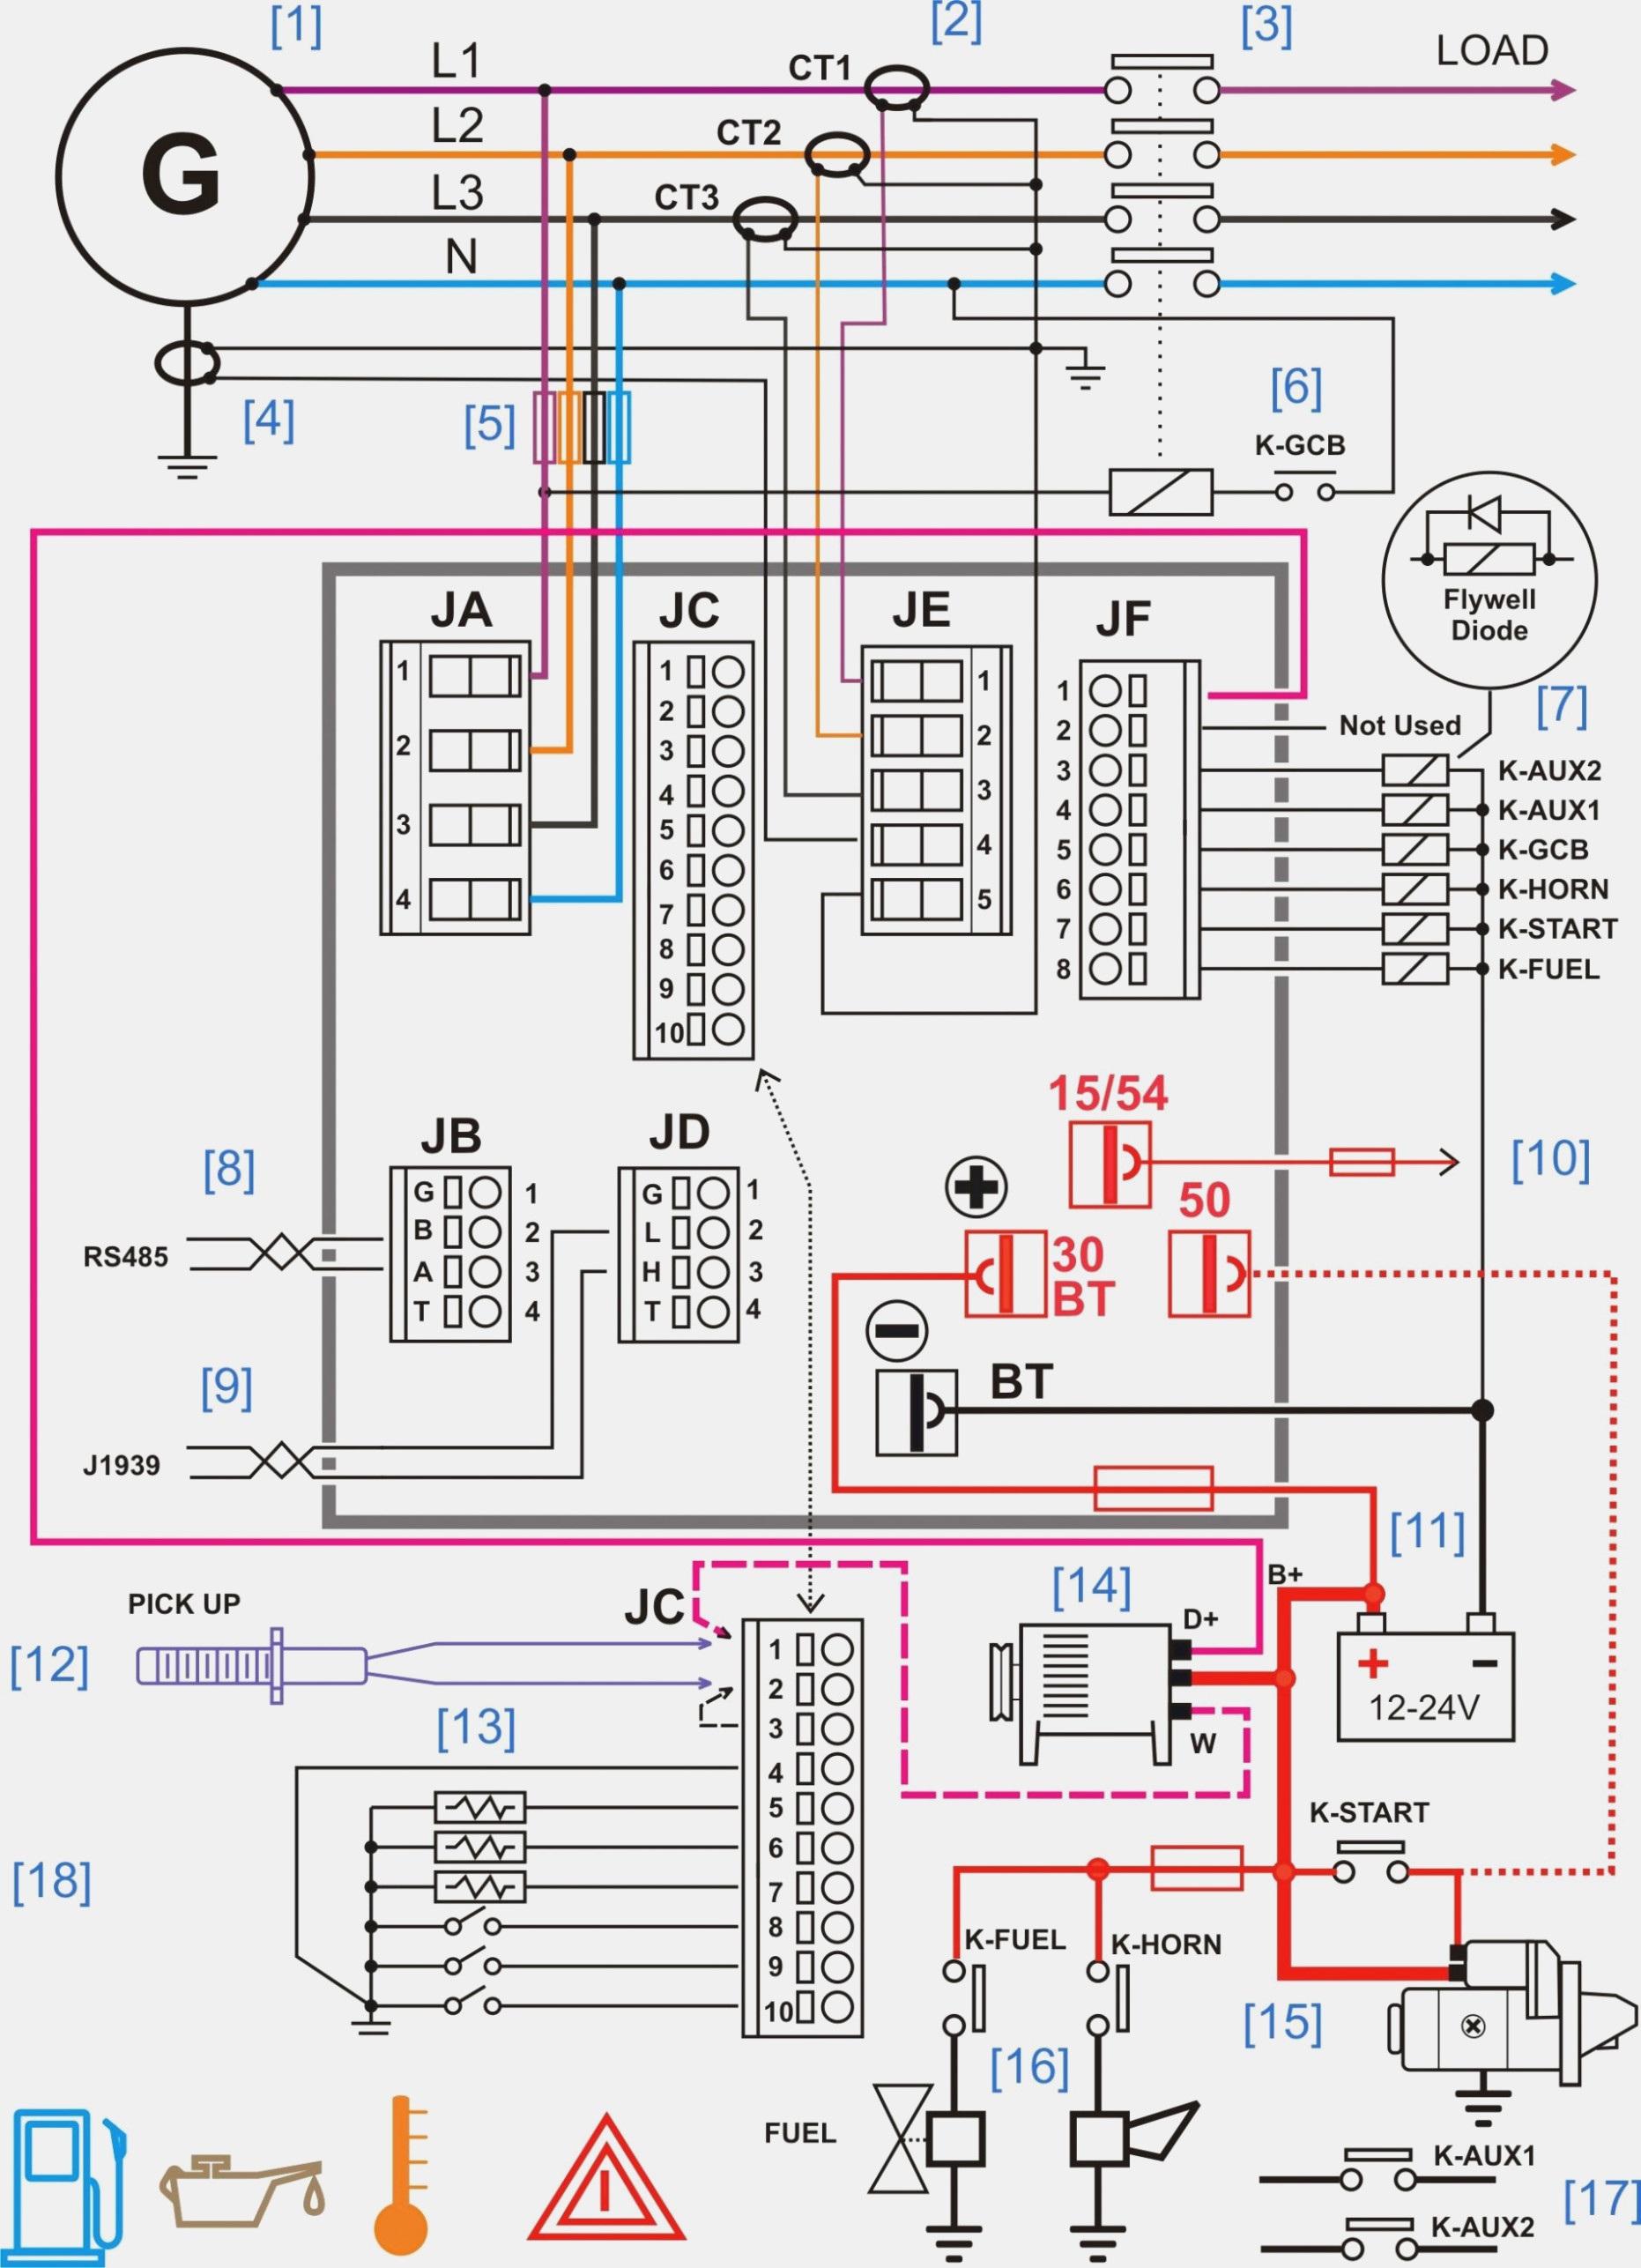 Siren Circuit Diagram On Fire Alarm Horn Strobe Wiring Diagram - Fire Alarm Horn Strobe Wiring Diagram